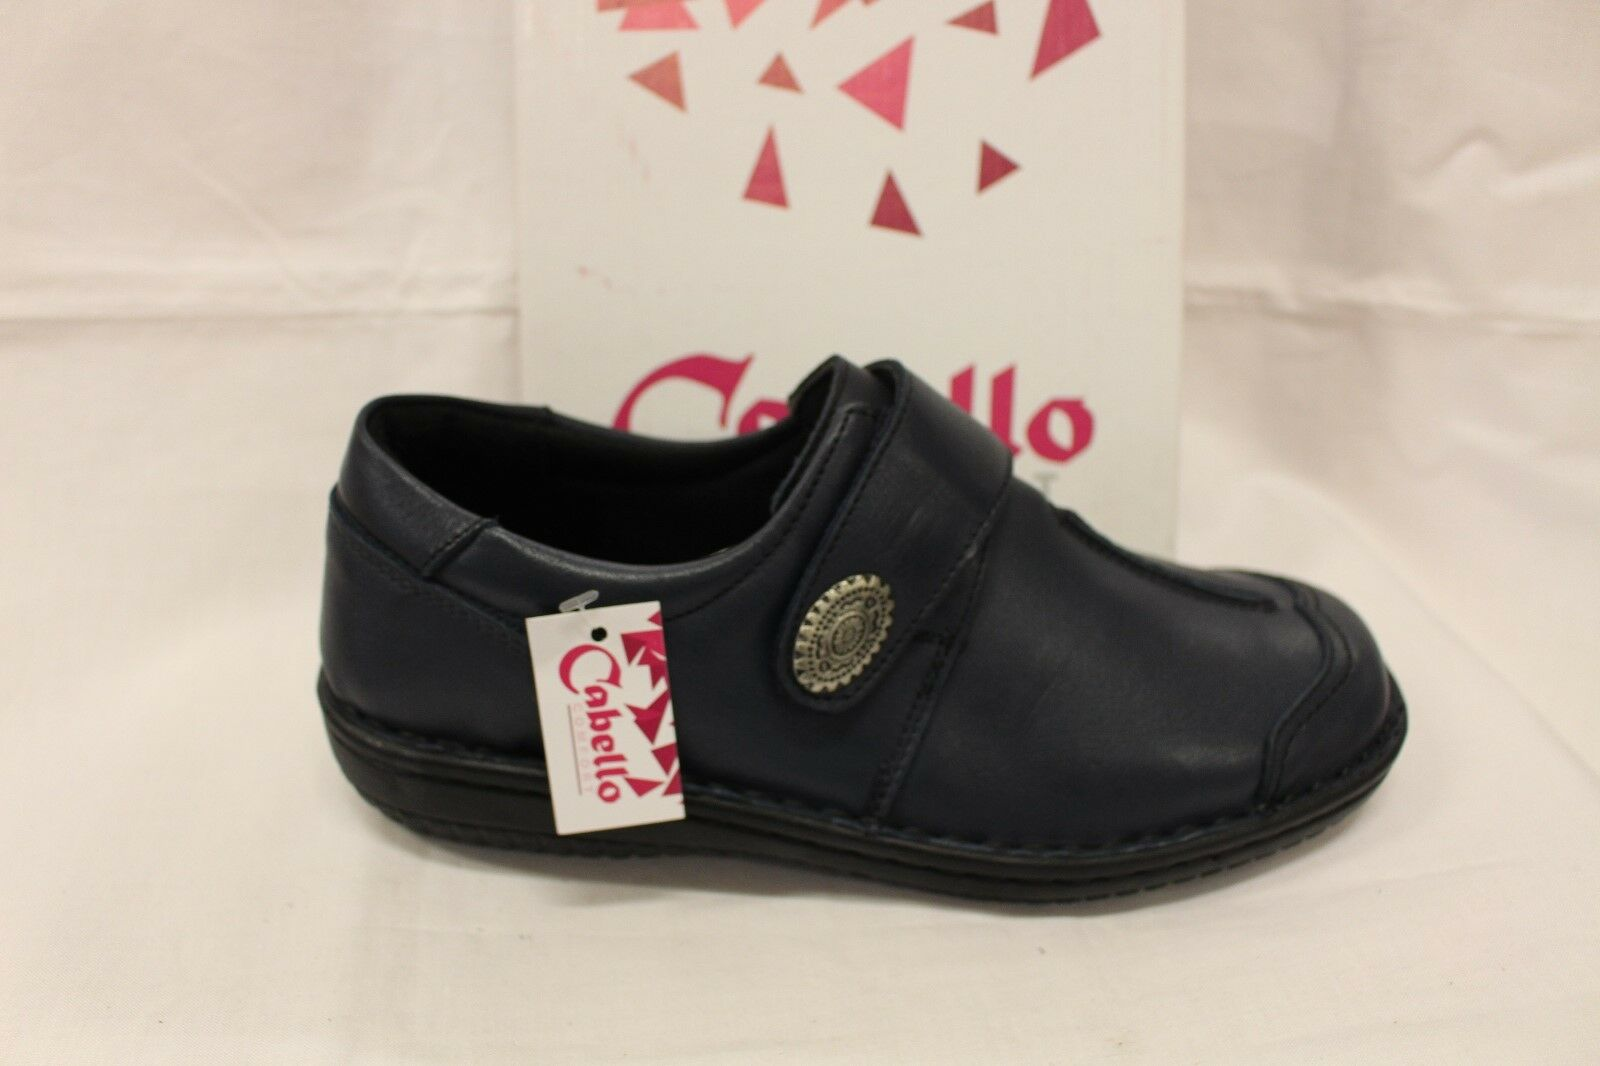 LADIES SHOES/FOOTWEAR - Cabello shoe 5072 navy slip on